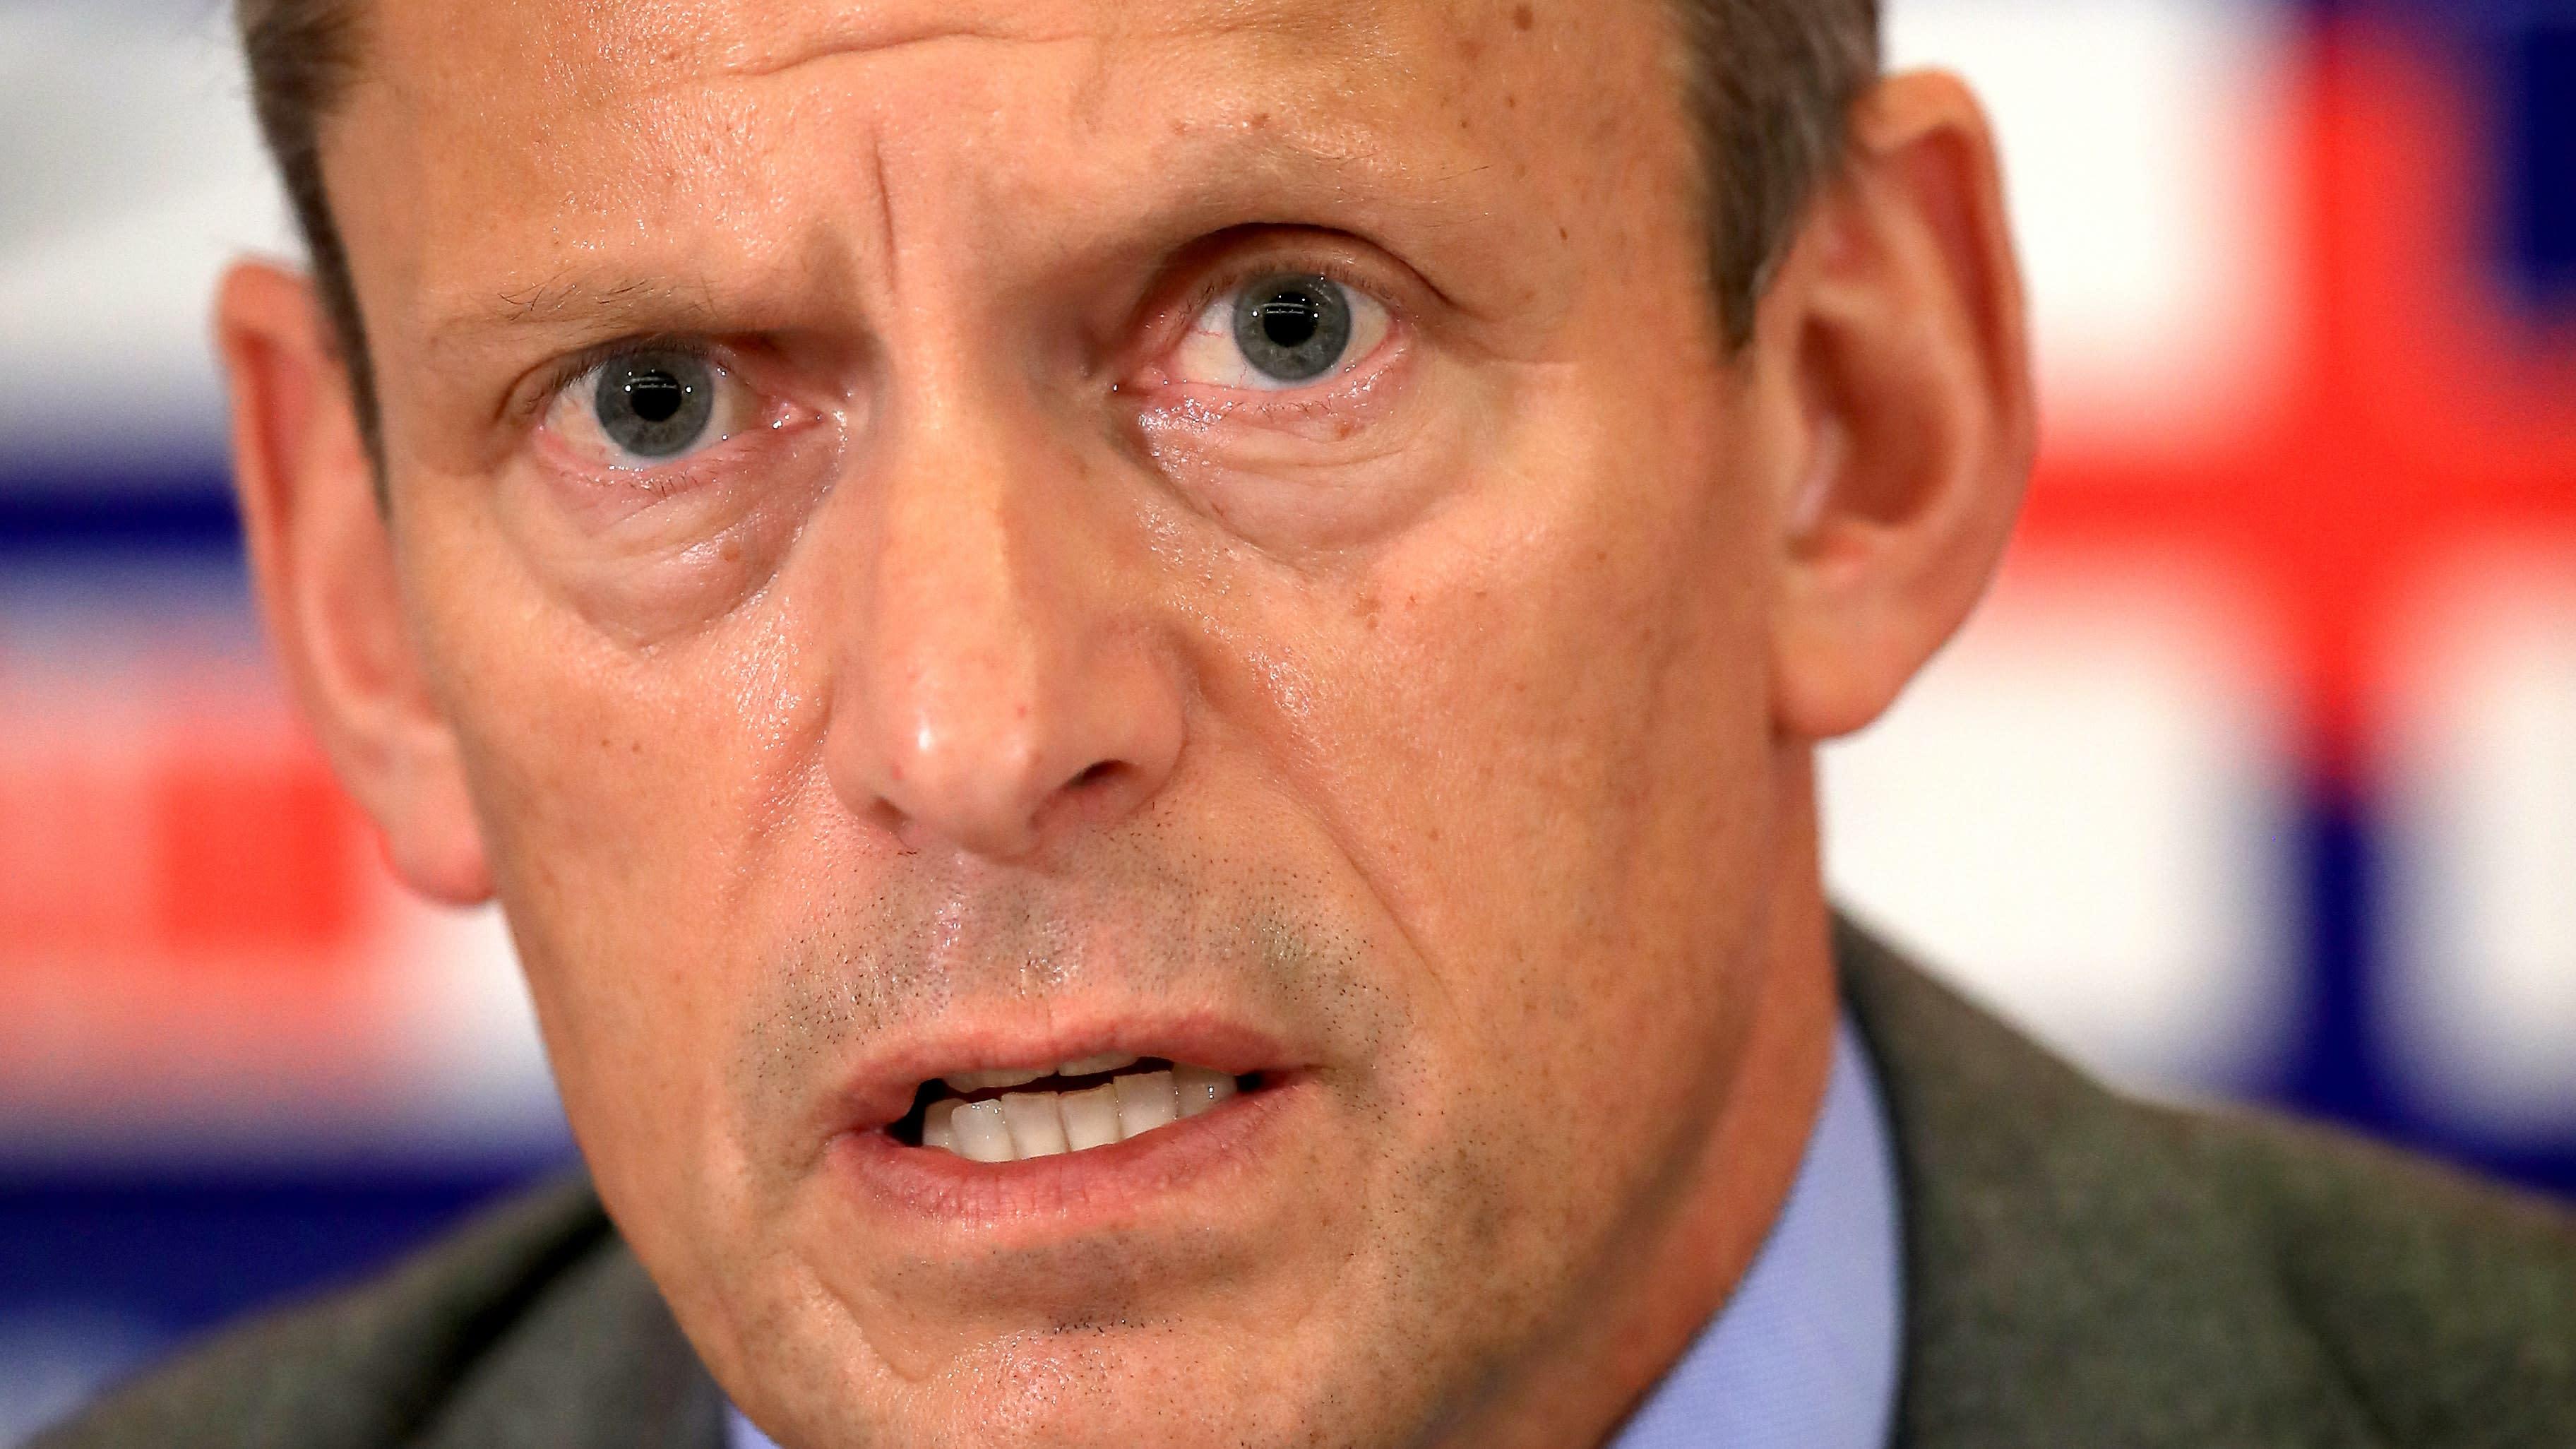 Ex-FA chief wins libel judgment over corruption allegations